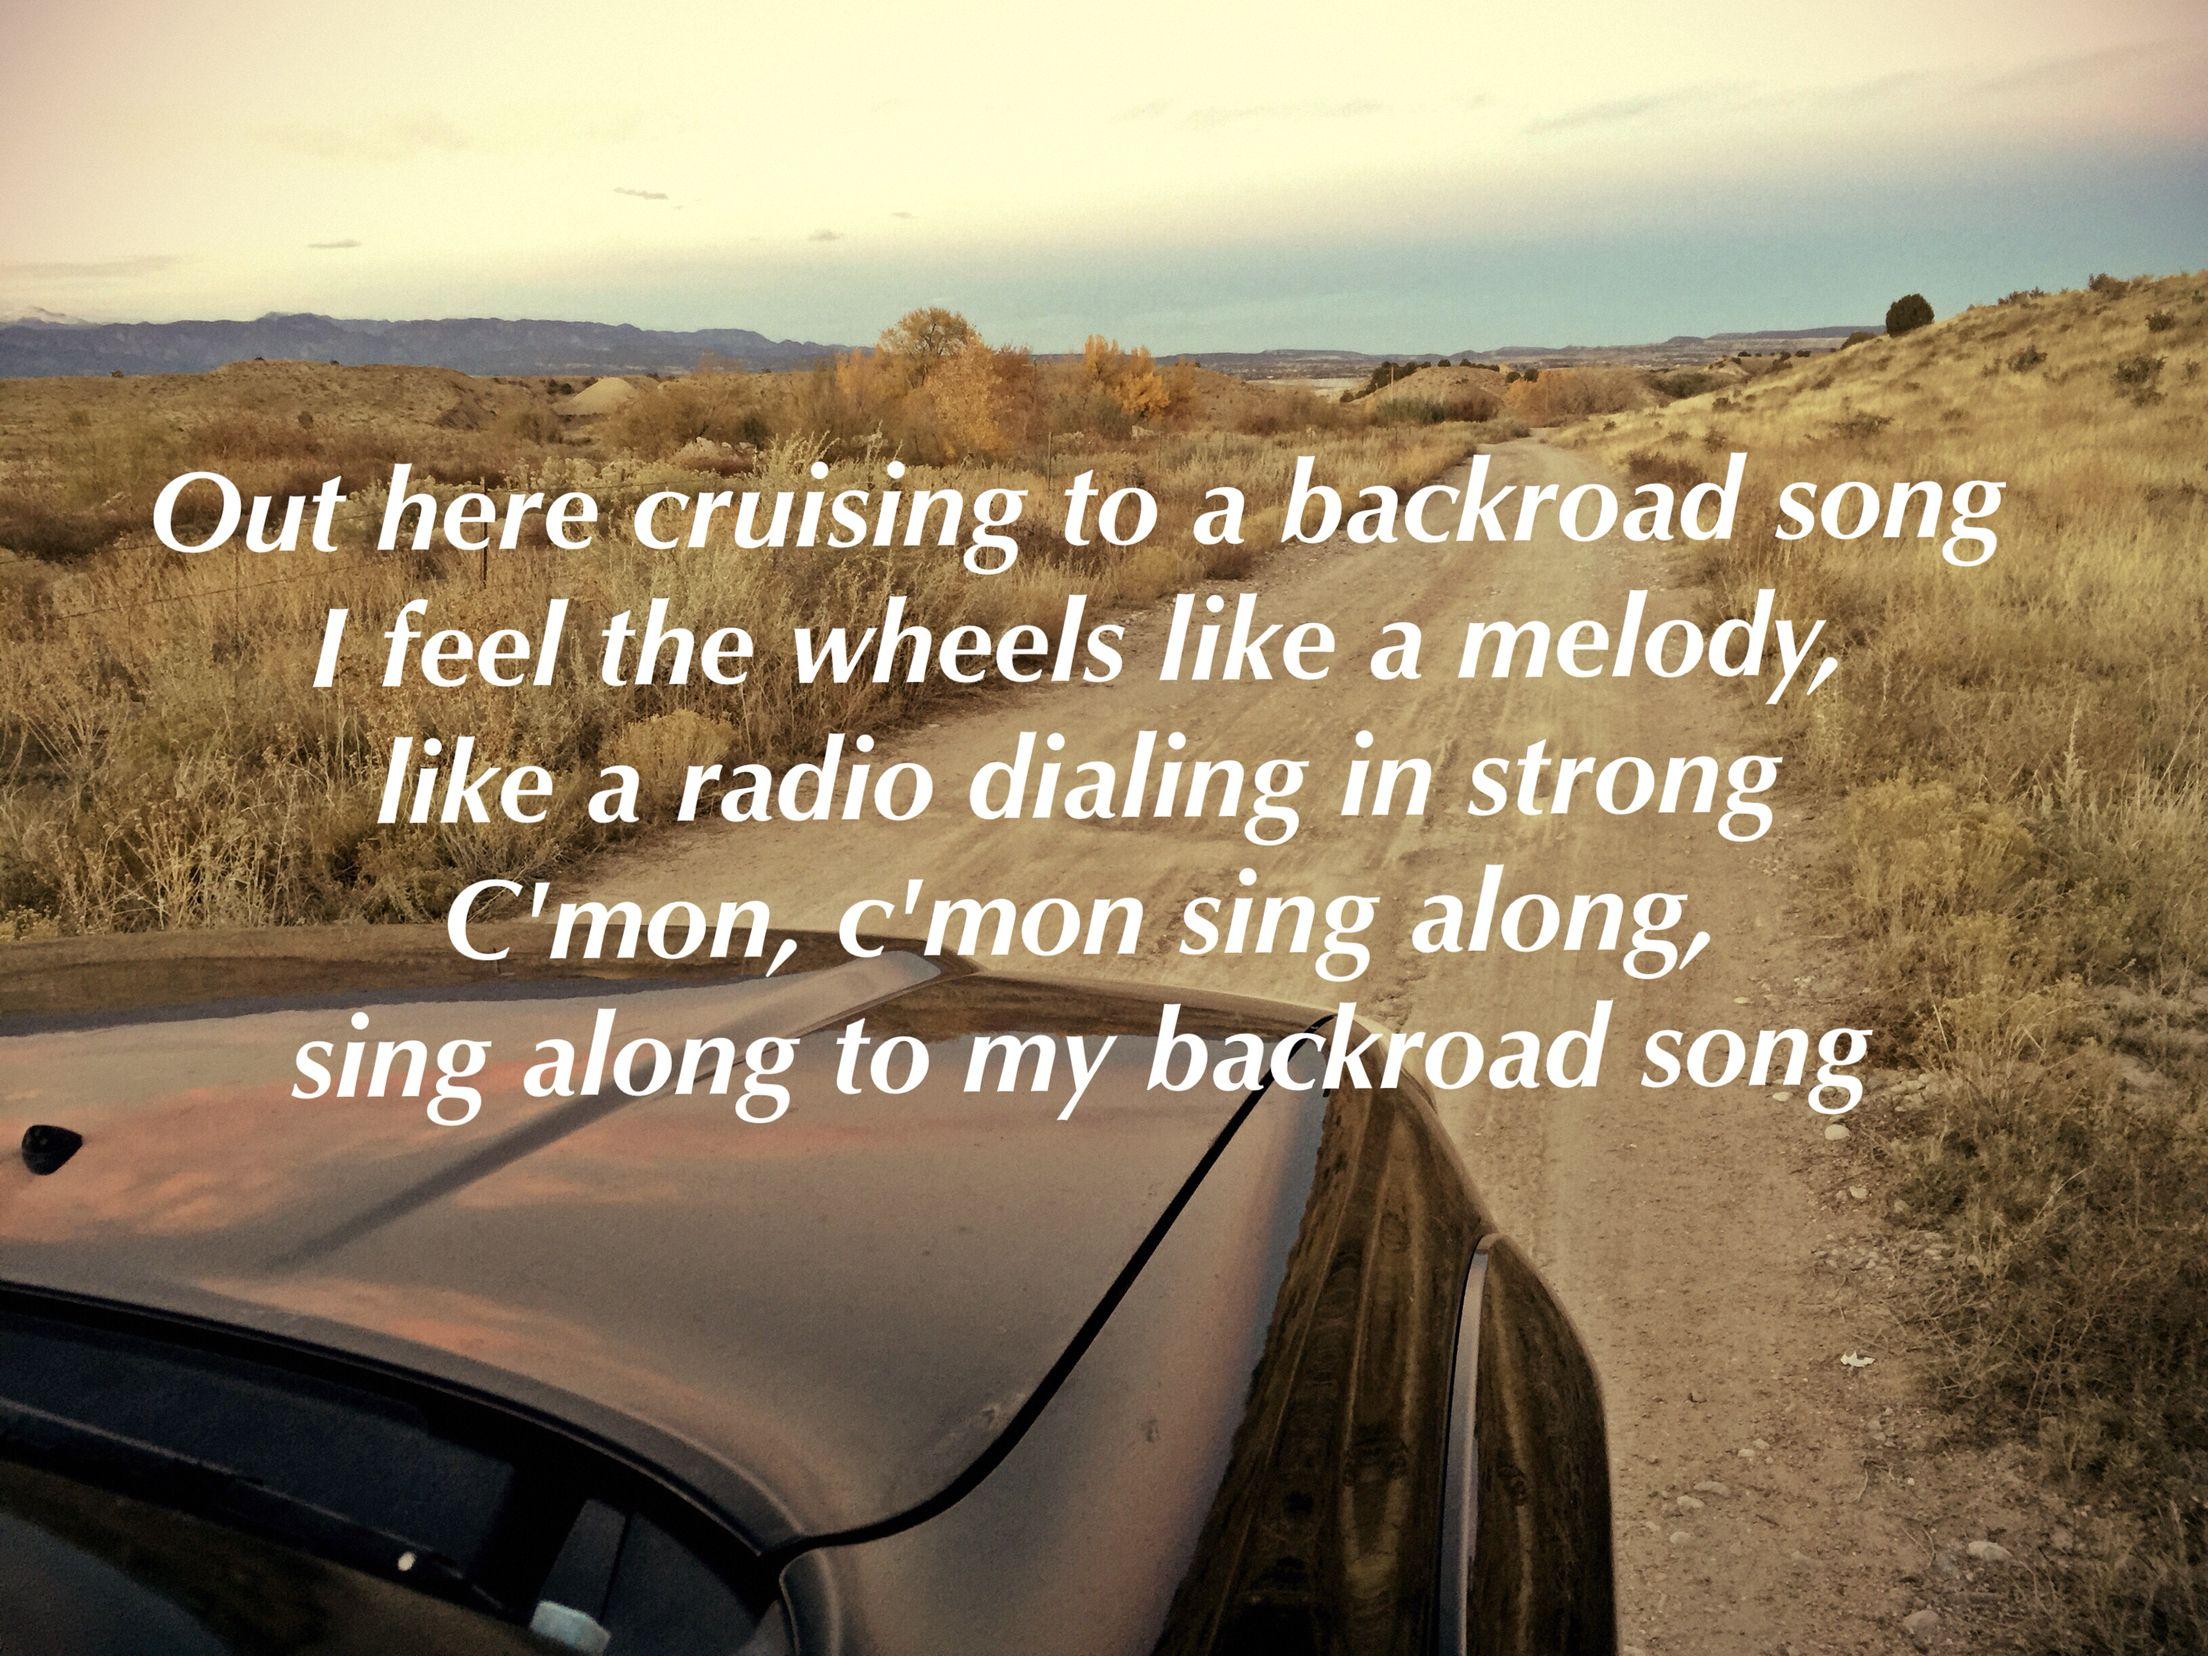 Granger Smith #lyrics #countrymusic